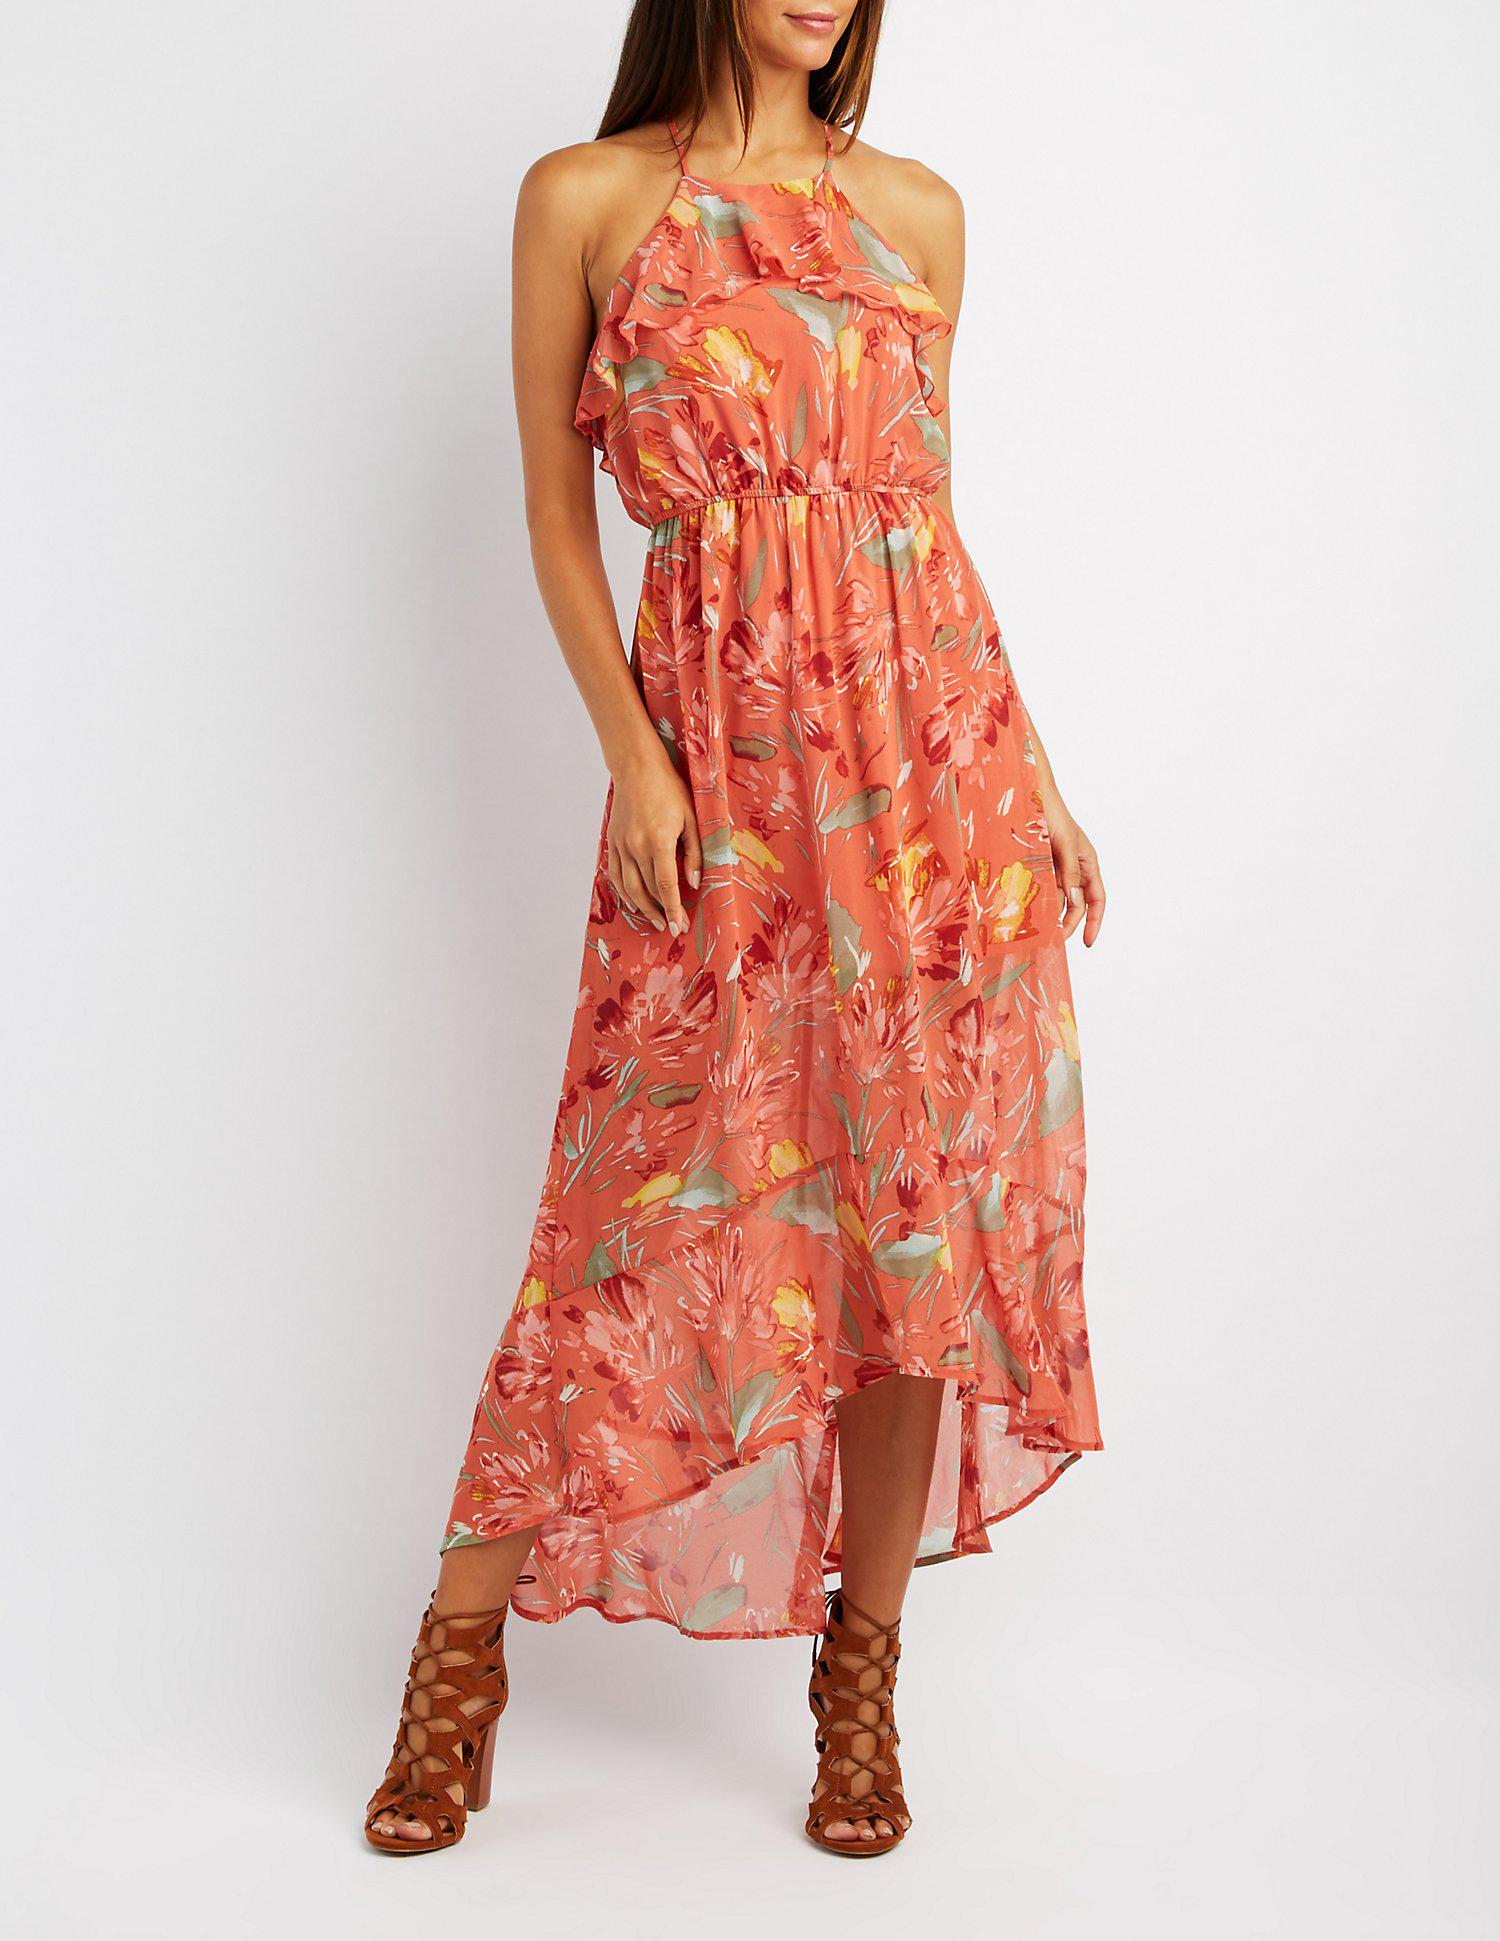 e99feb268a0f Lyst - Charlotte Russe Floral Ruffle Bib Neck Maxi Dress in Orange